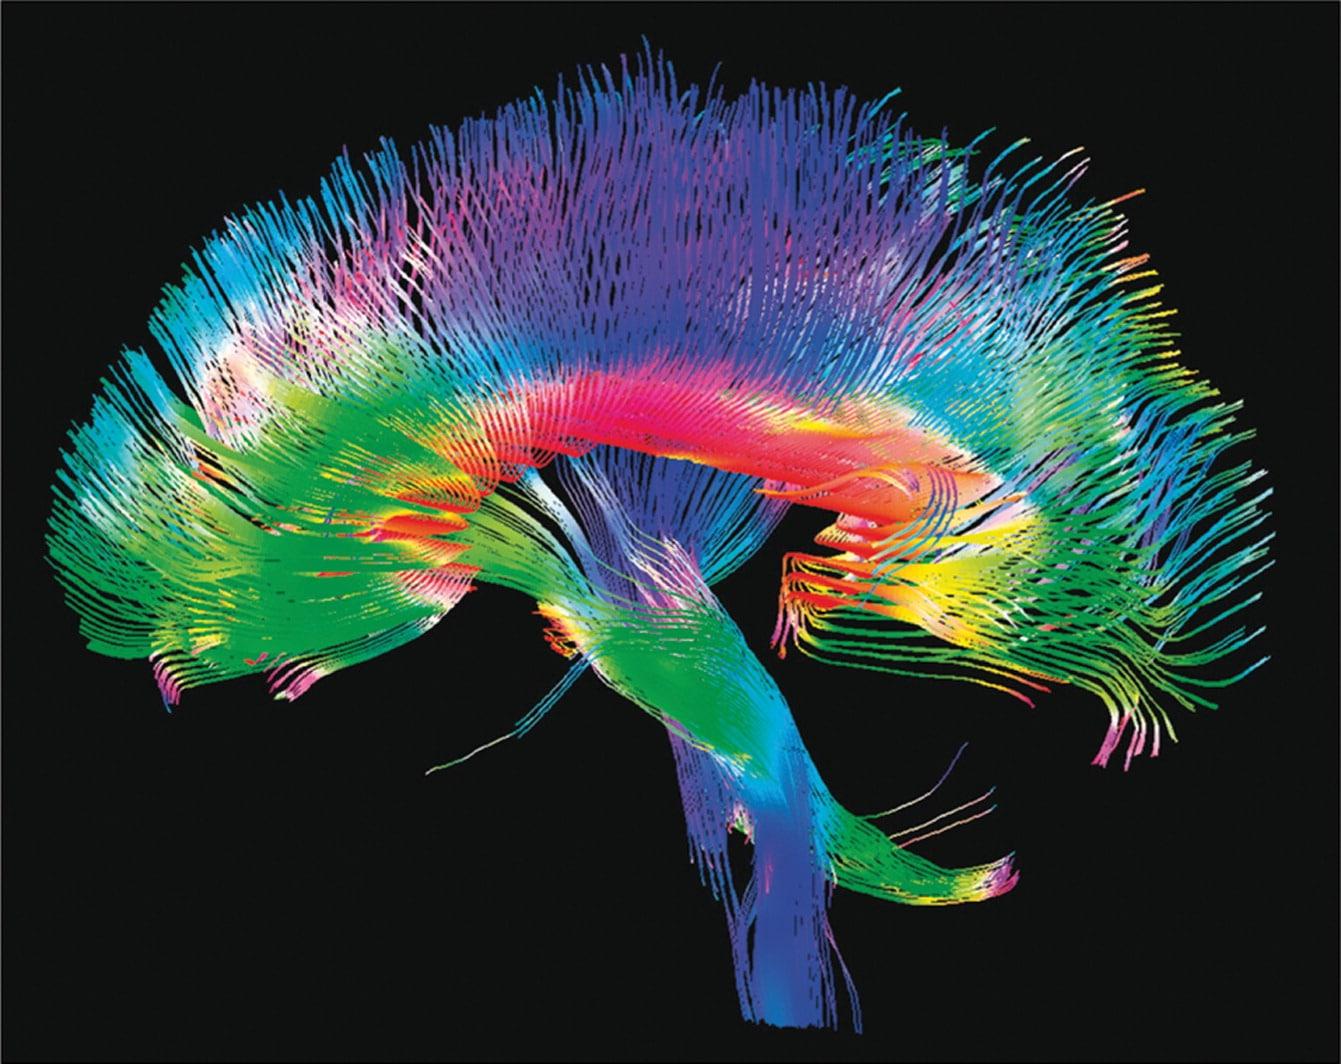 Relax More - Hoe stress je brein letterlijk doet krimpen